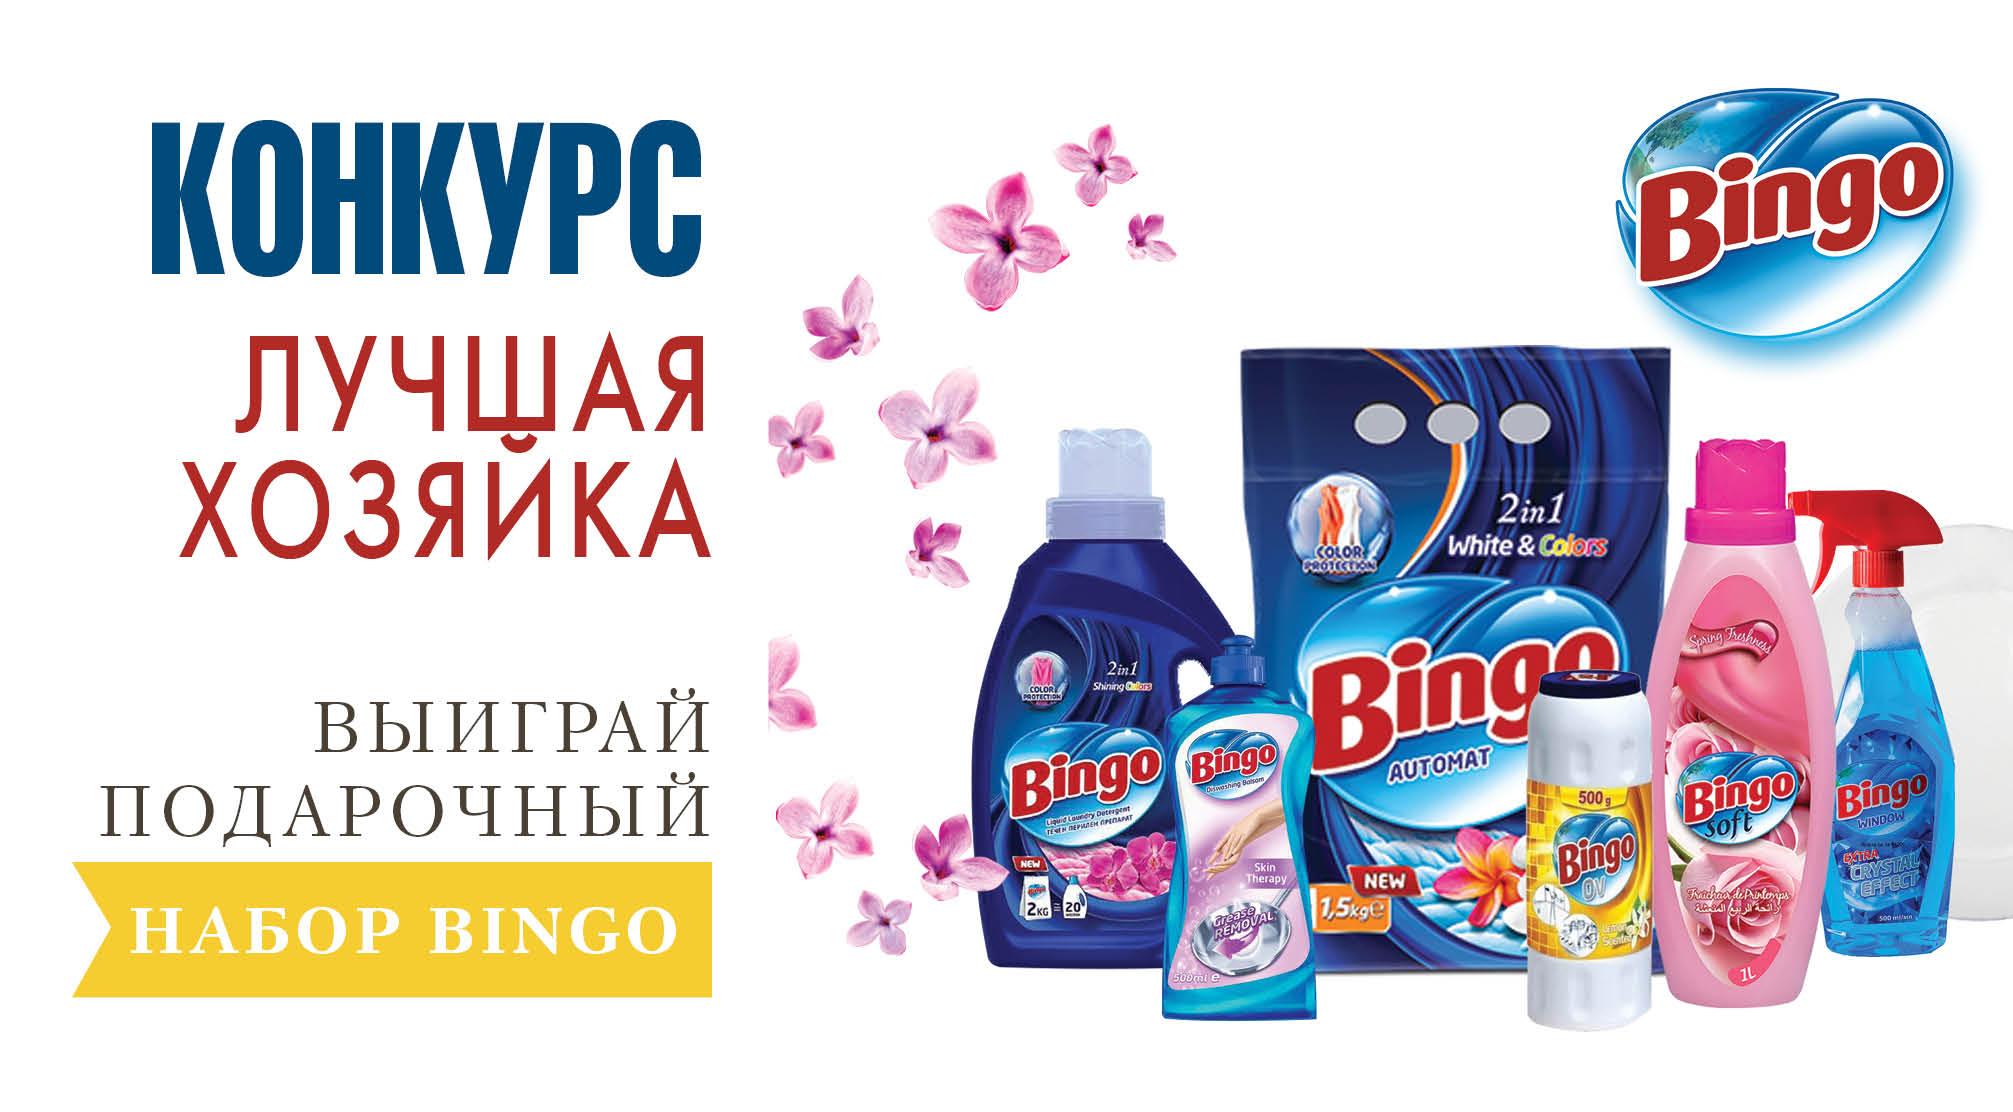 Конкурс Bingo на сайте Sanatate